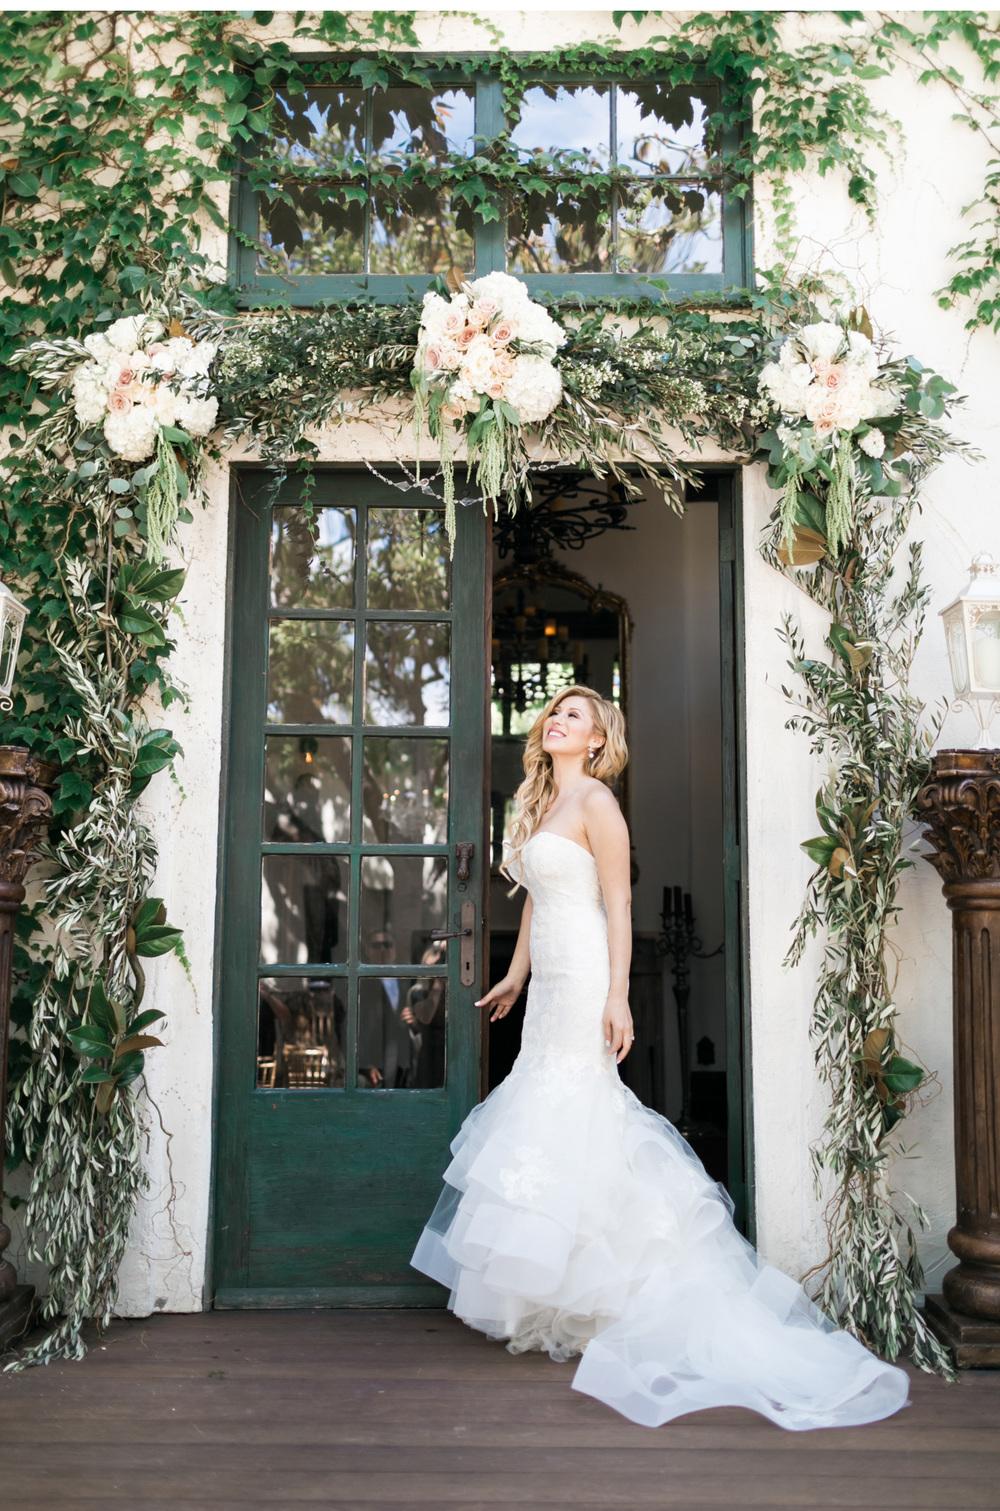 San-Juan-Capistrano-Wedding-Style-Me-Pretty-Natalie-Schutt-Photography_10.jpg